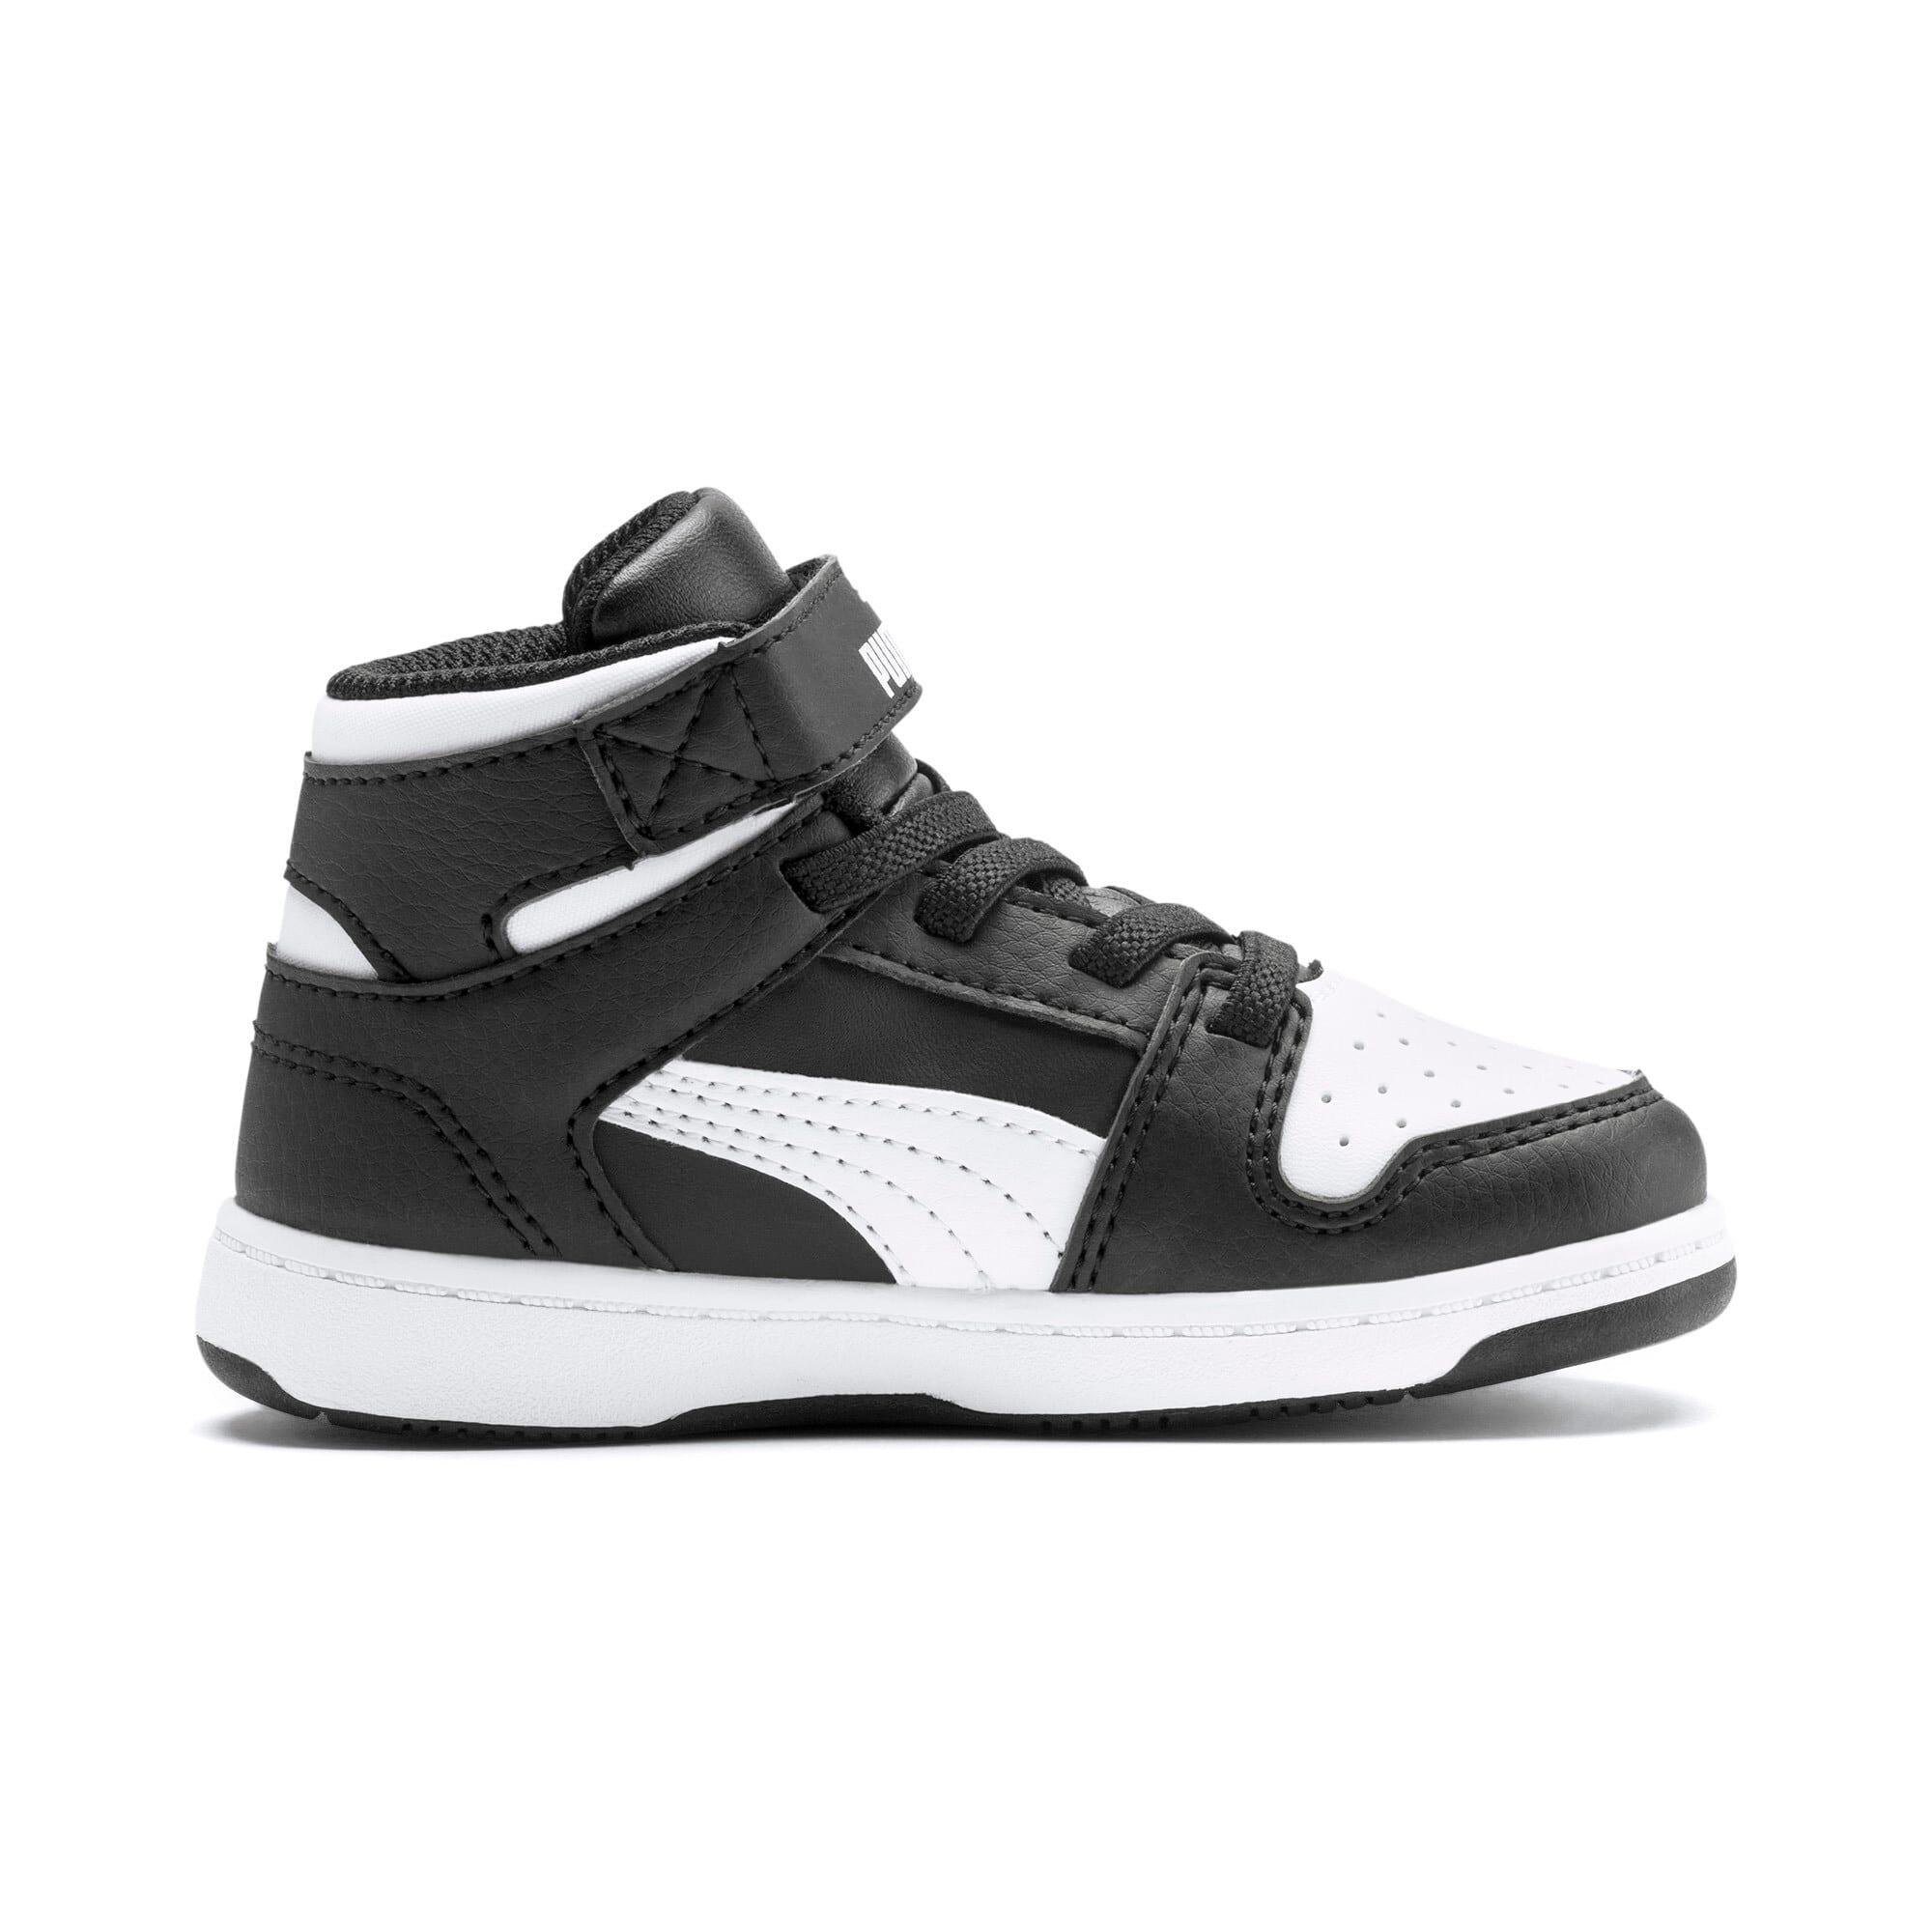 Thumbnail 5 of PUMA Rebound LayUp Toddler Shoes, Puma Black-Puma White, medium